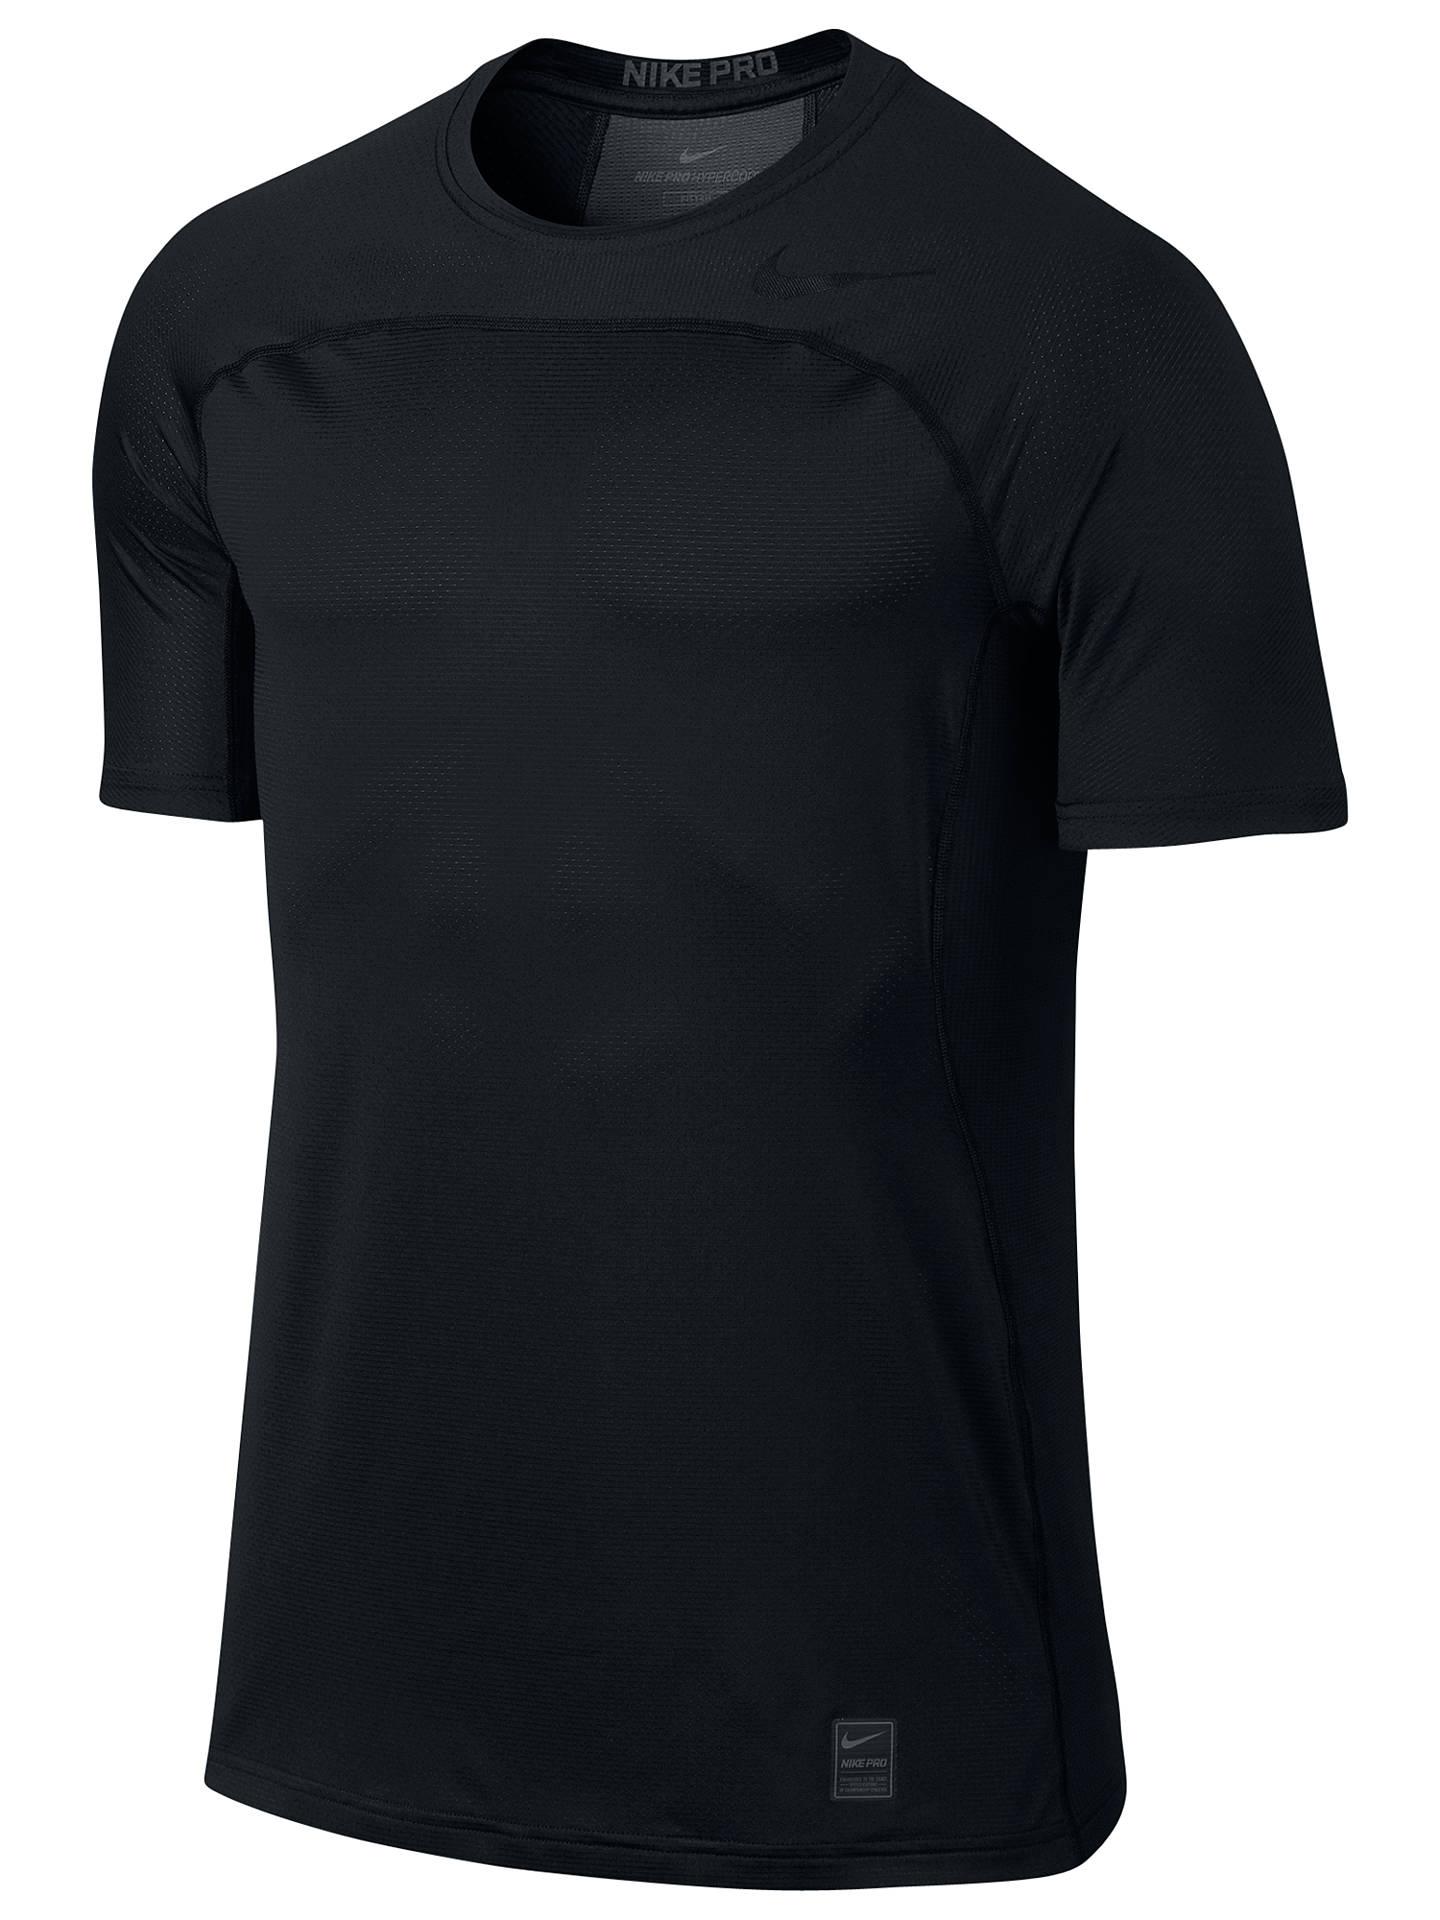 30975ef04 Buy Nike Pro Hypercool Training Top, Black, S Online at johnlewis.com ...